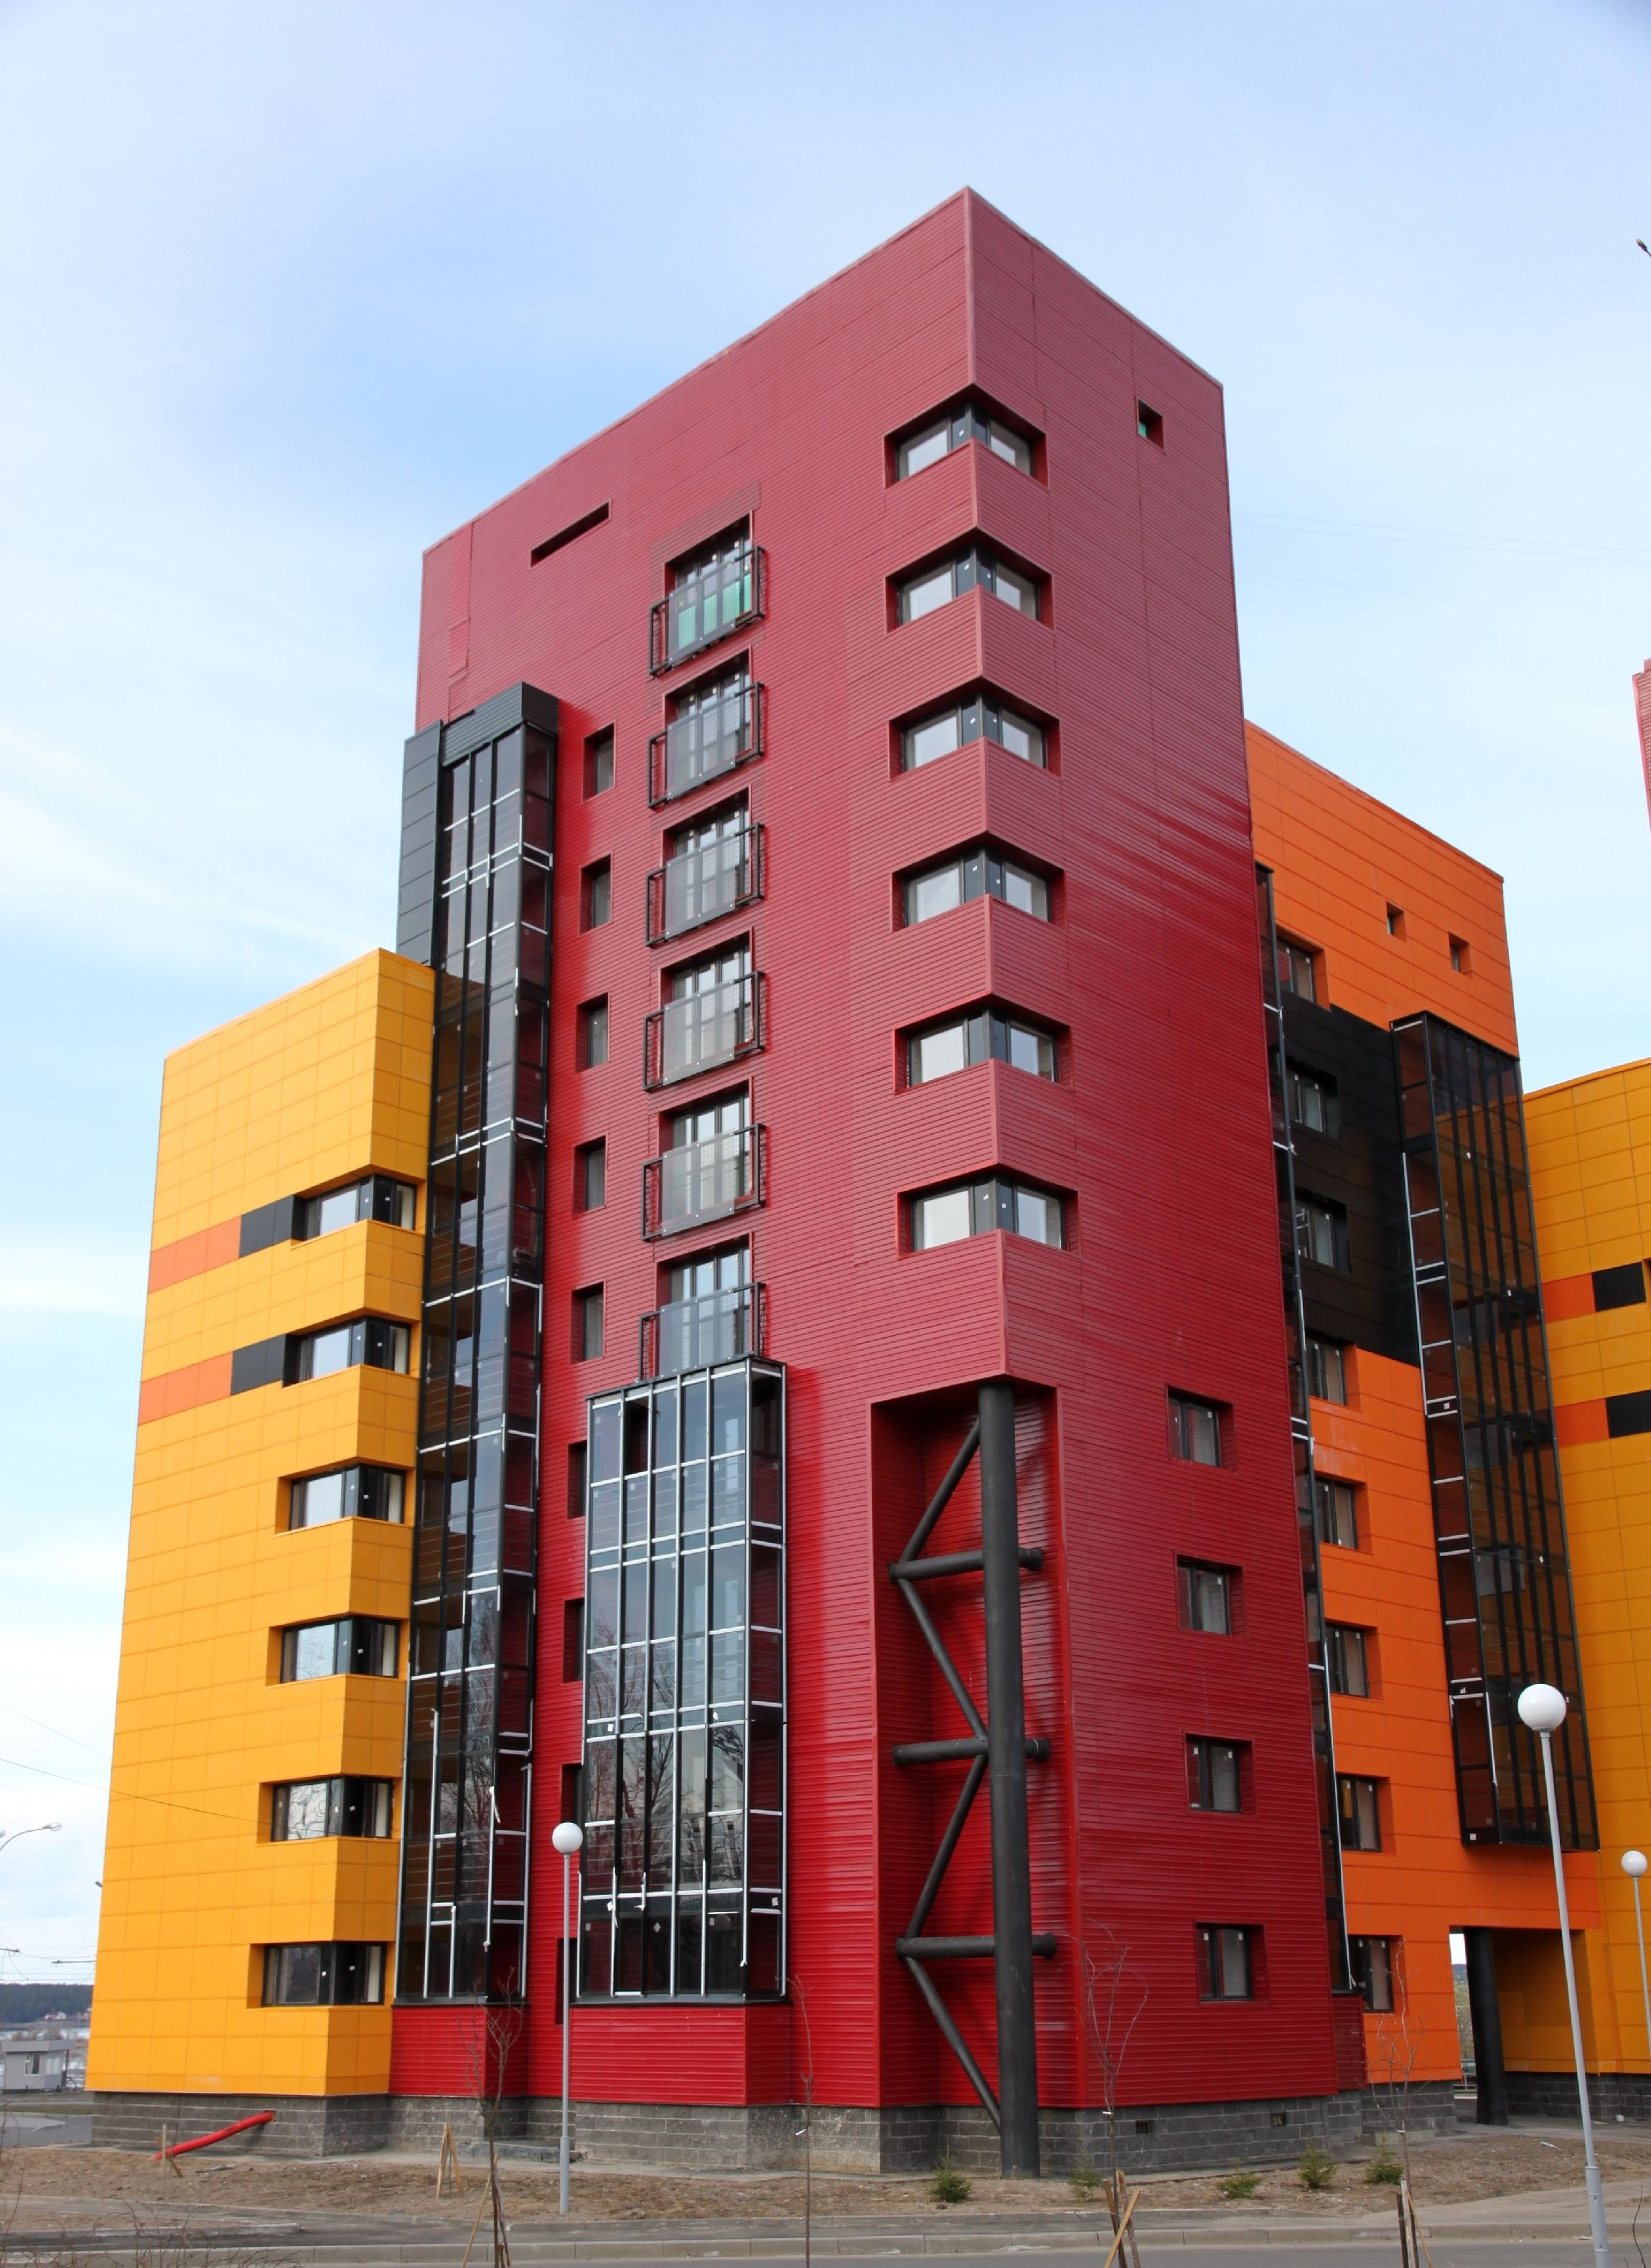 примеру, вам фасад многоэтажки фото ли